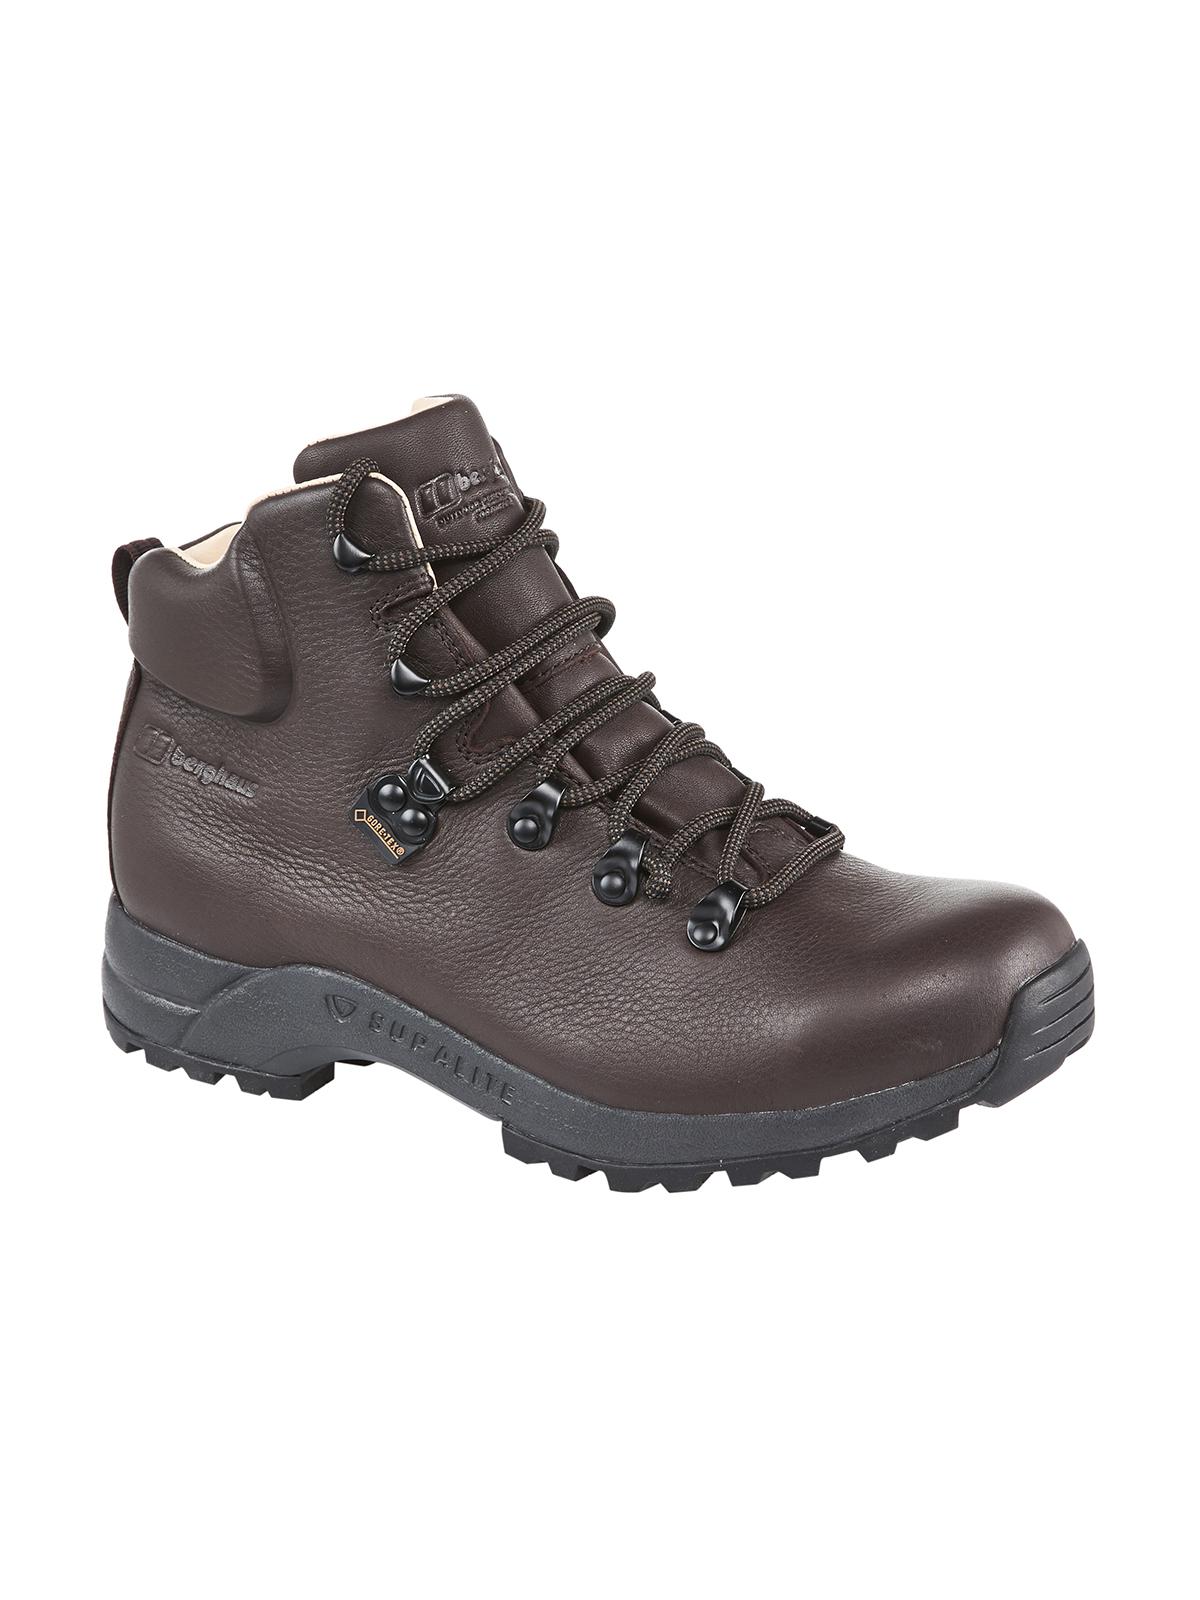 Berghaus Supalite II Gortex boots Kate.jpg